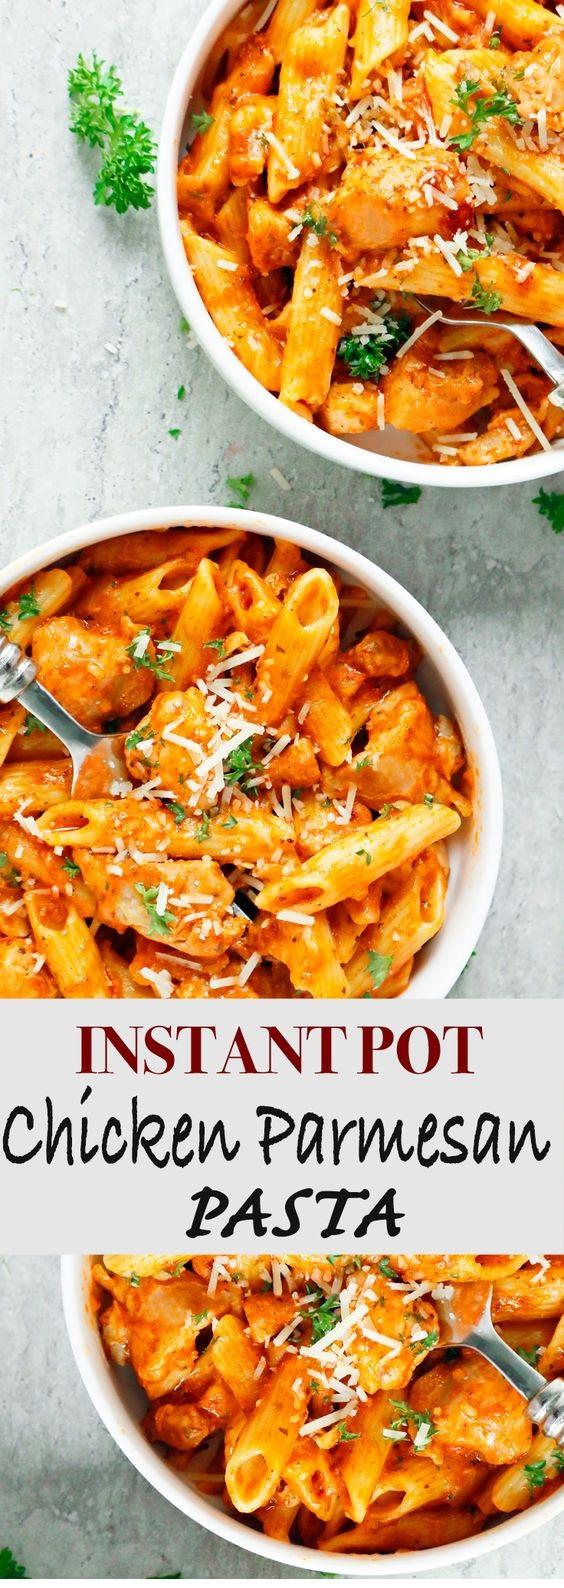 Instant Pot Chicken Parmesan Pasta